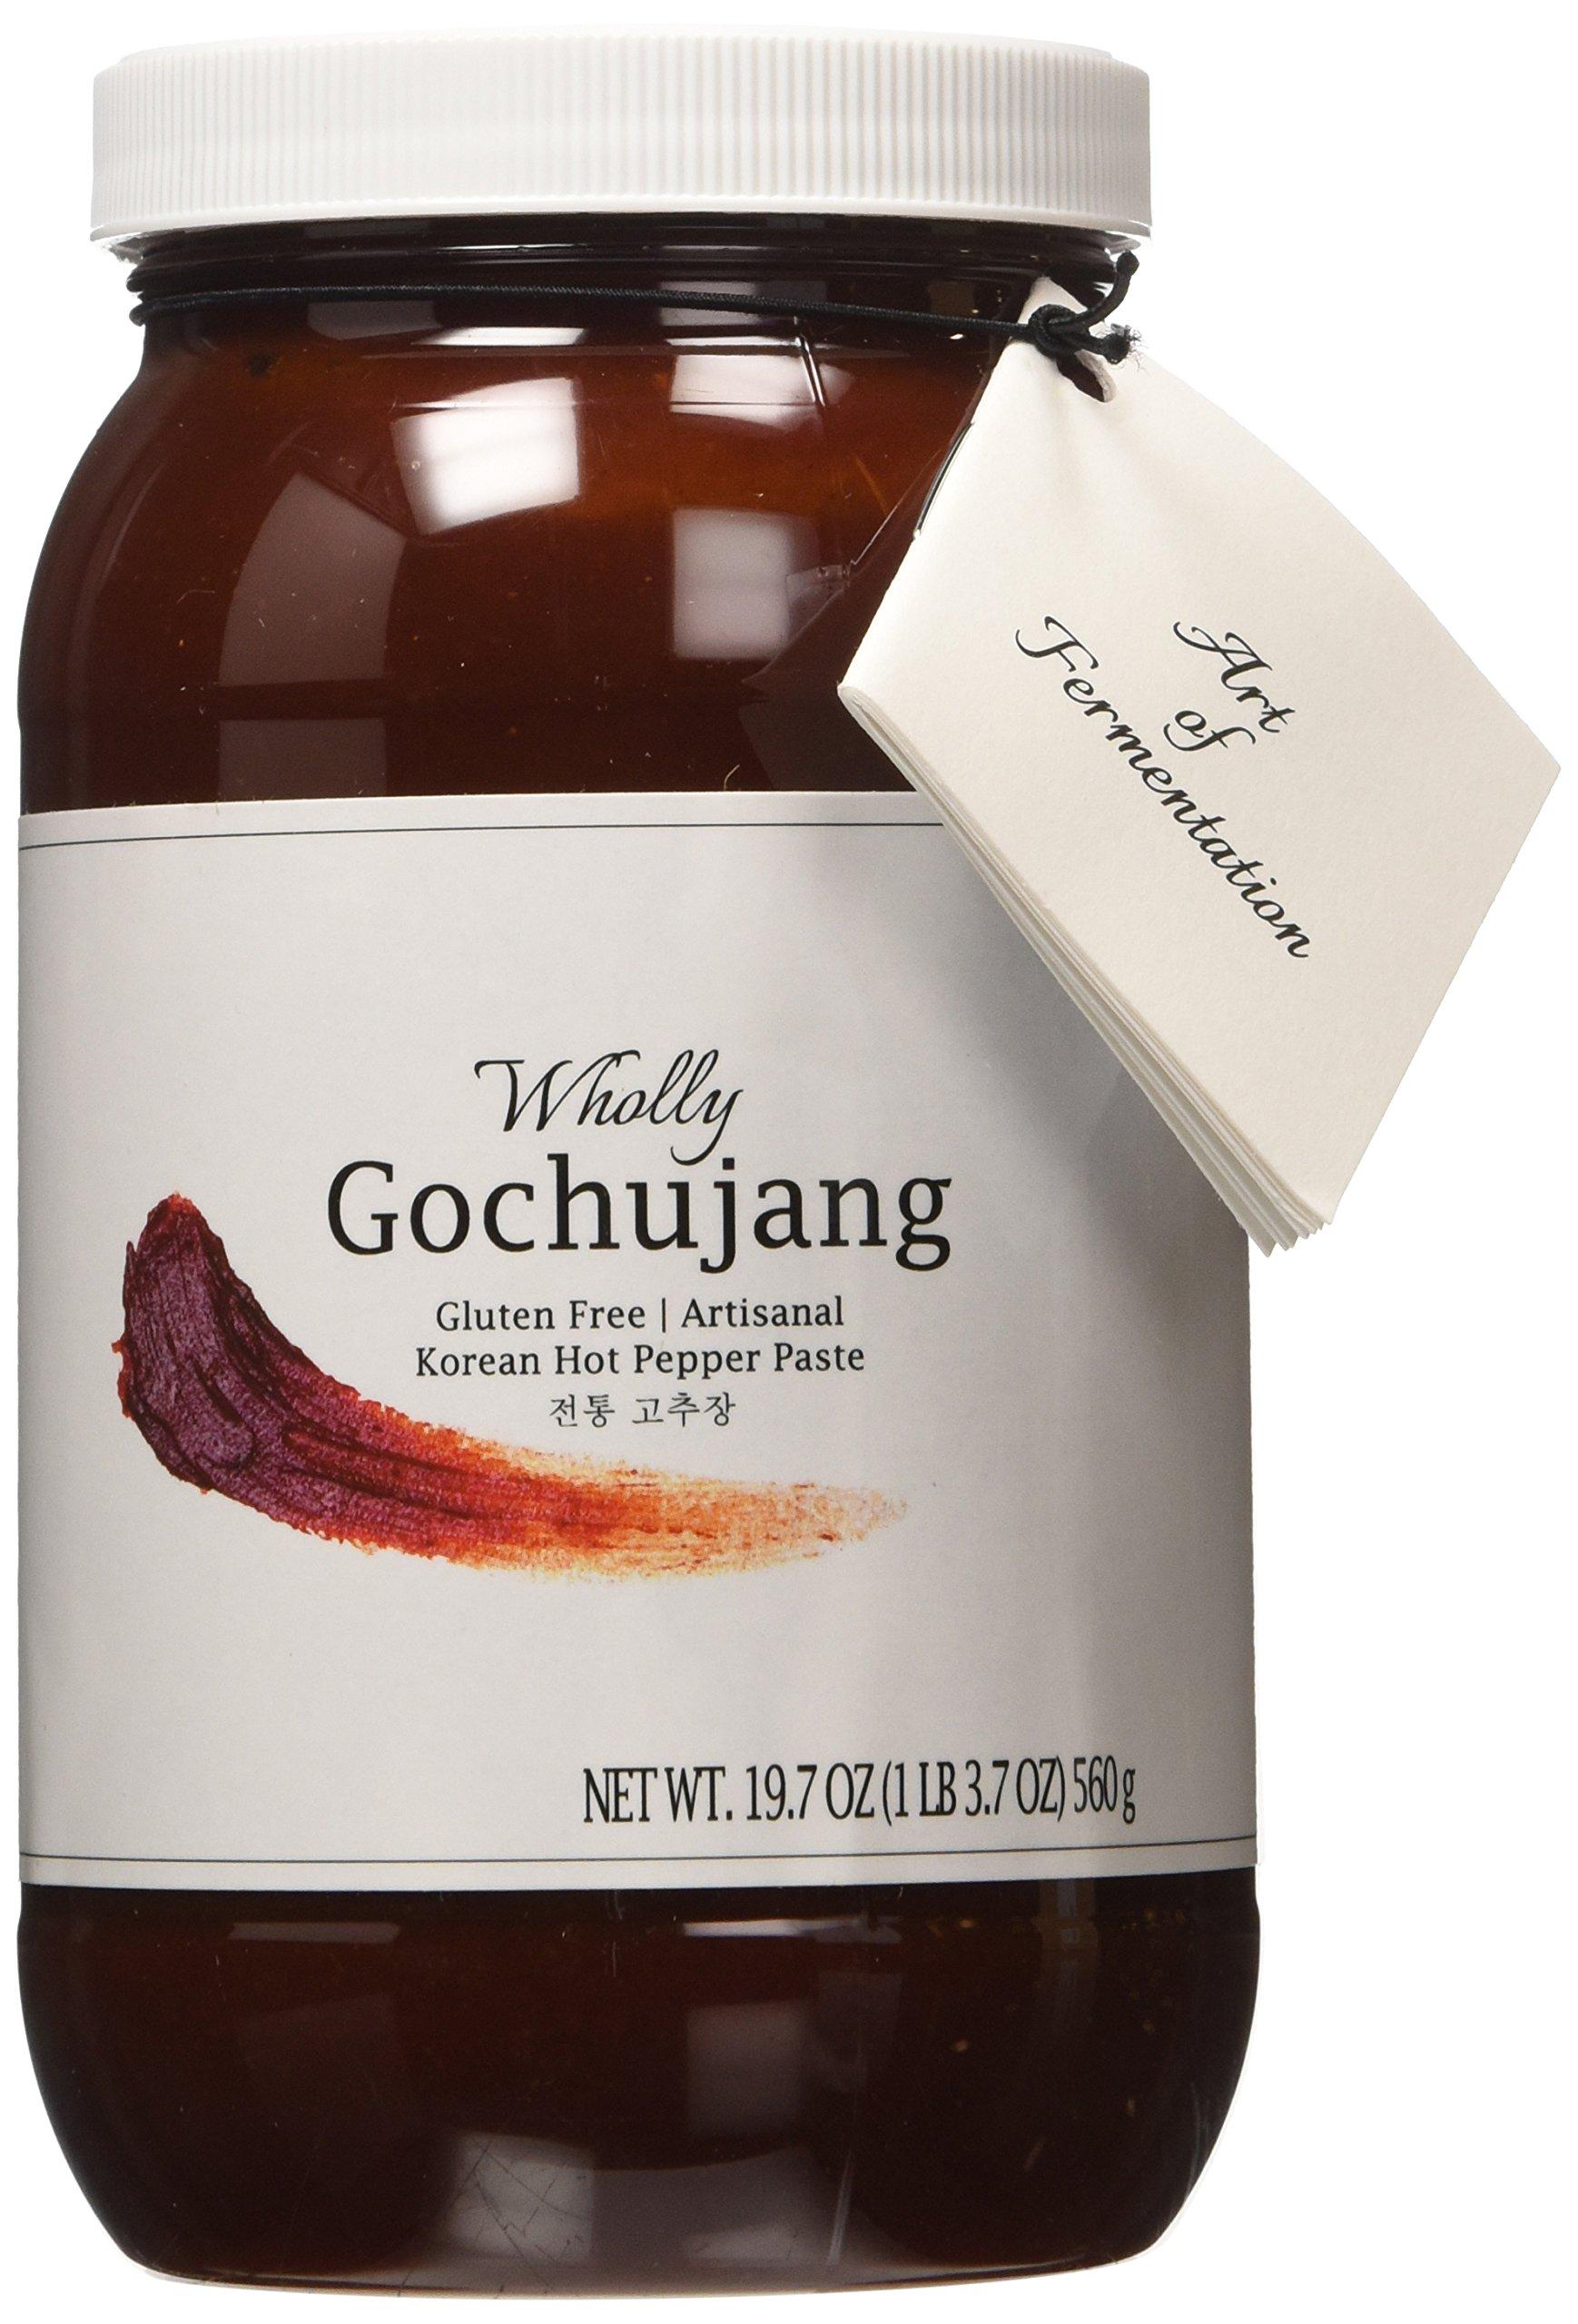 Wholly Gochujang, Premium Gluten-free Unpasteurized Artisanal Korean Hot Pepper Paste (Spicy, 19.7 oz)